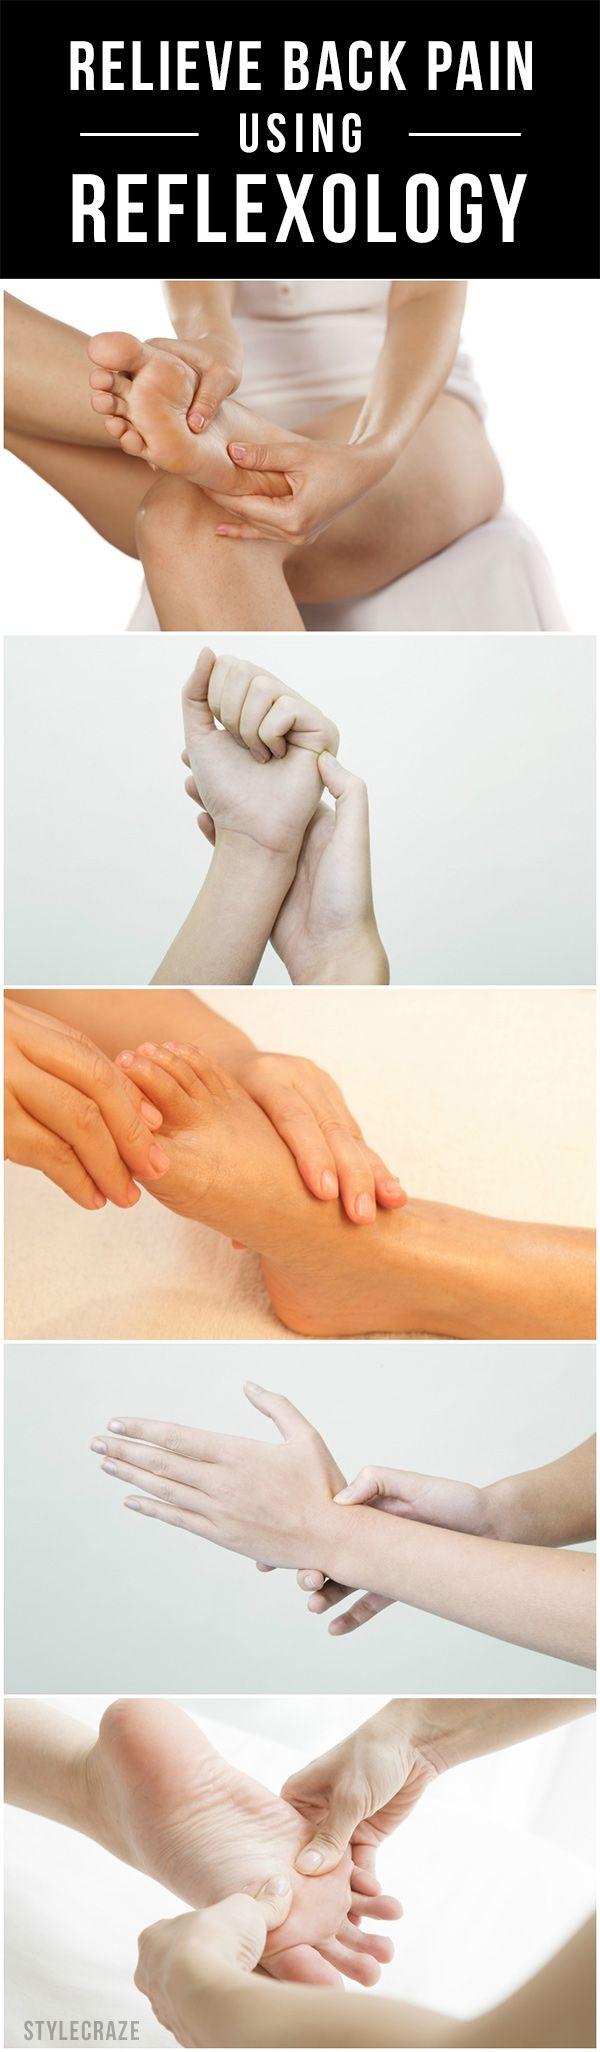 best acupressure images on Pinterest  Acupuncture Massage